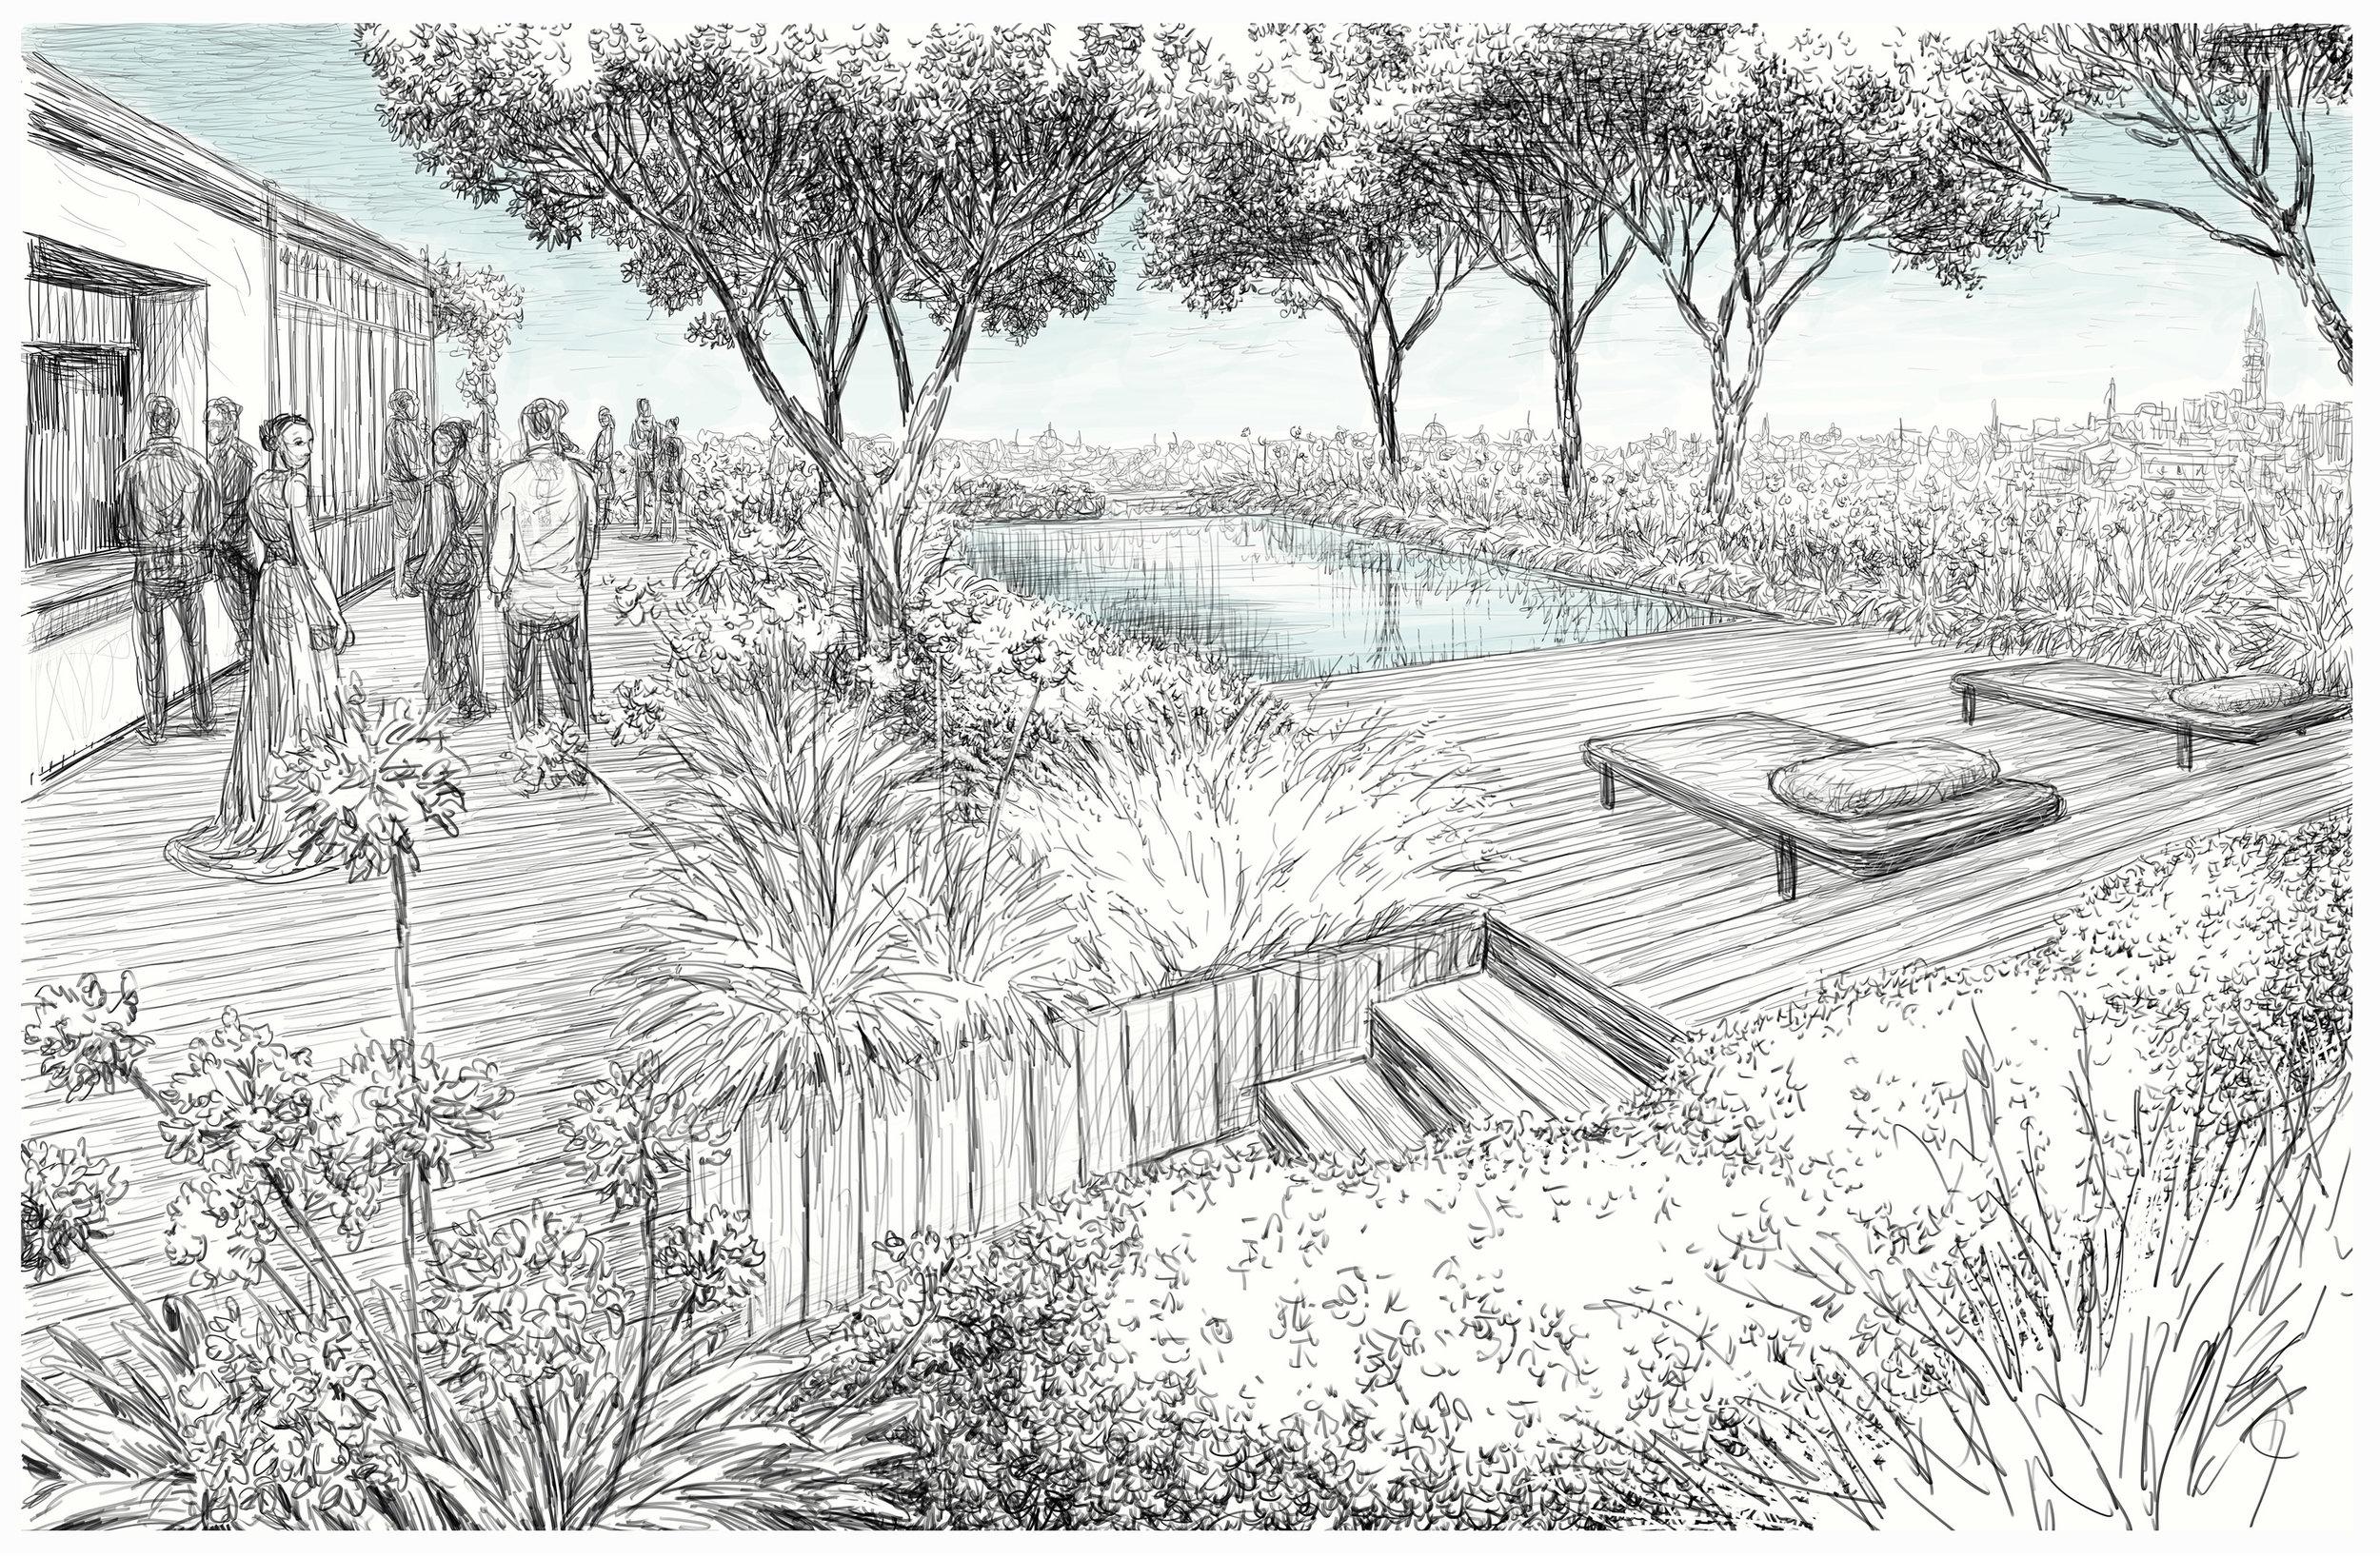 building 1 rooftop (drawn by massimo milano / enea landscape architecture)